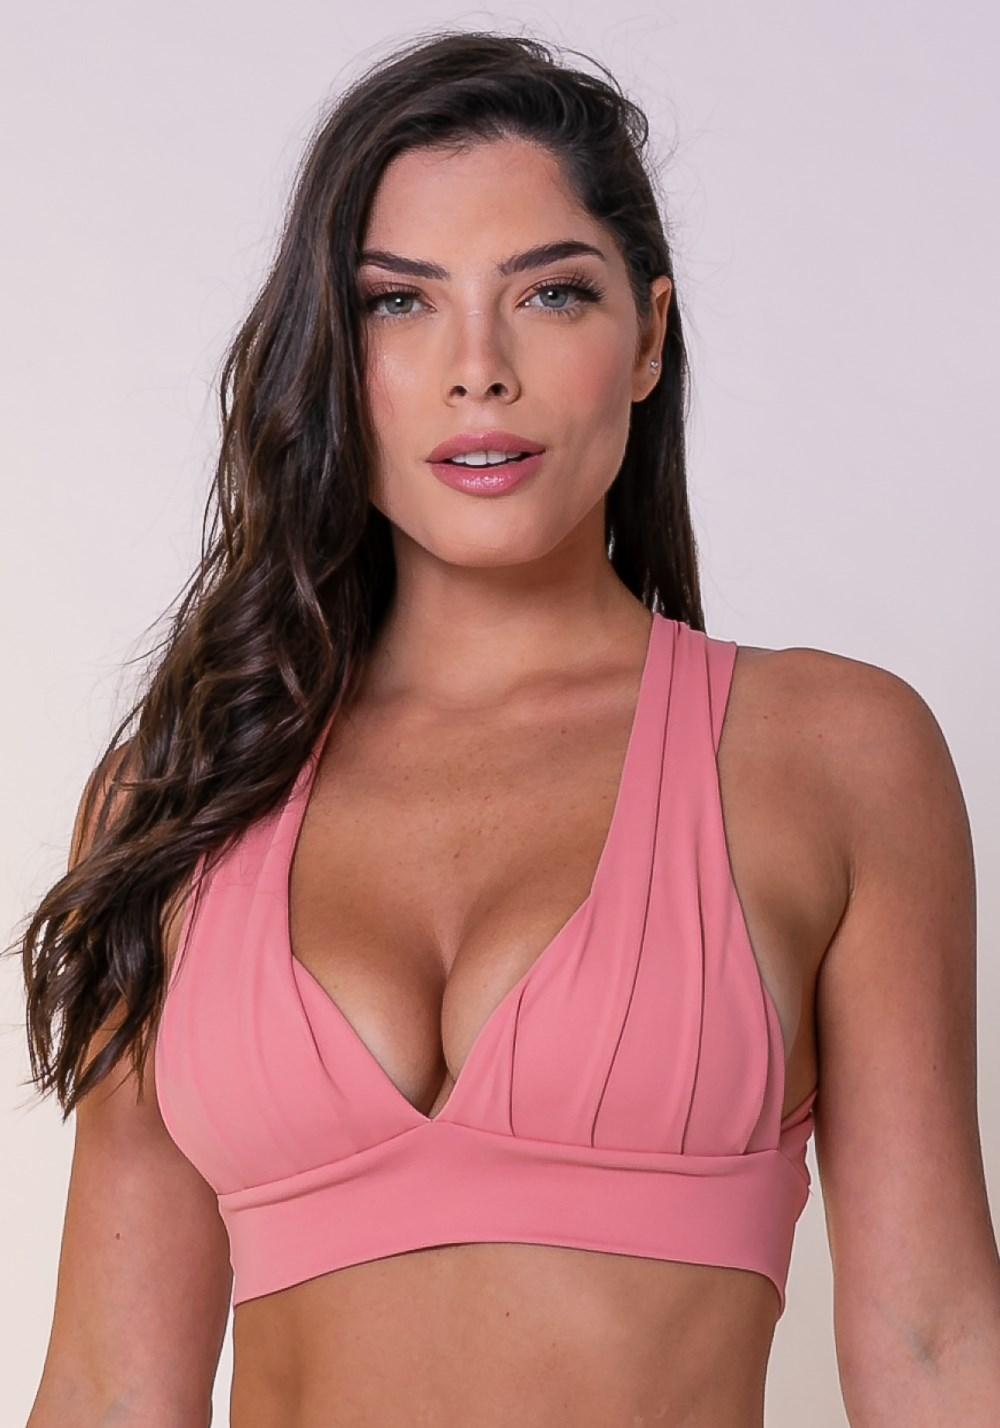 Top fitness drapeado rosê com bojo